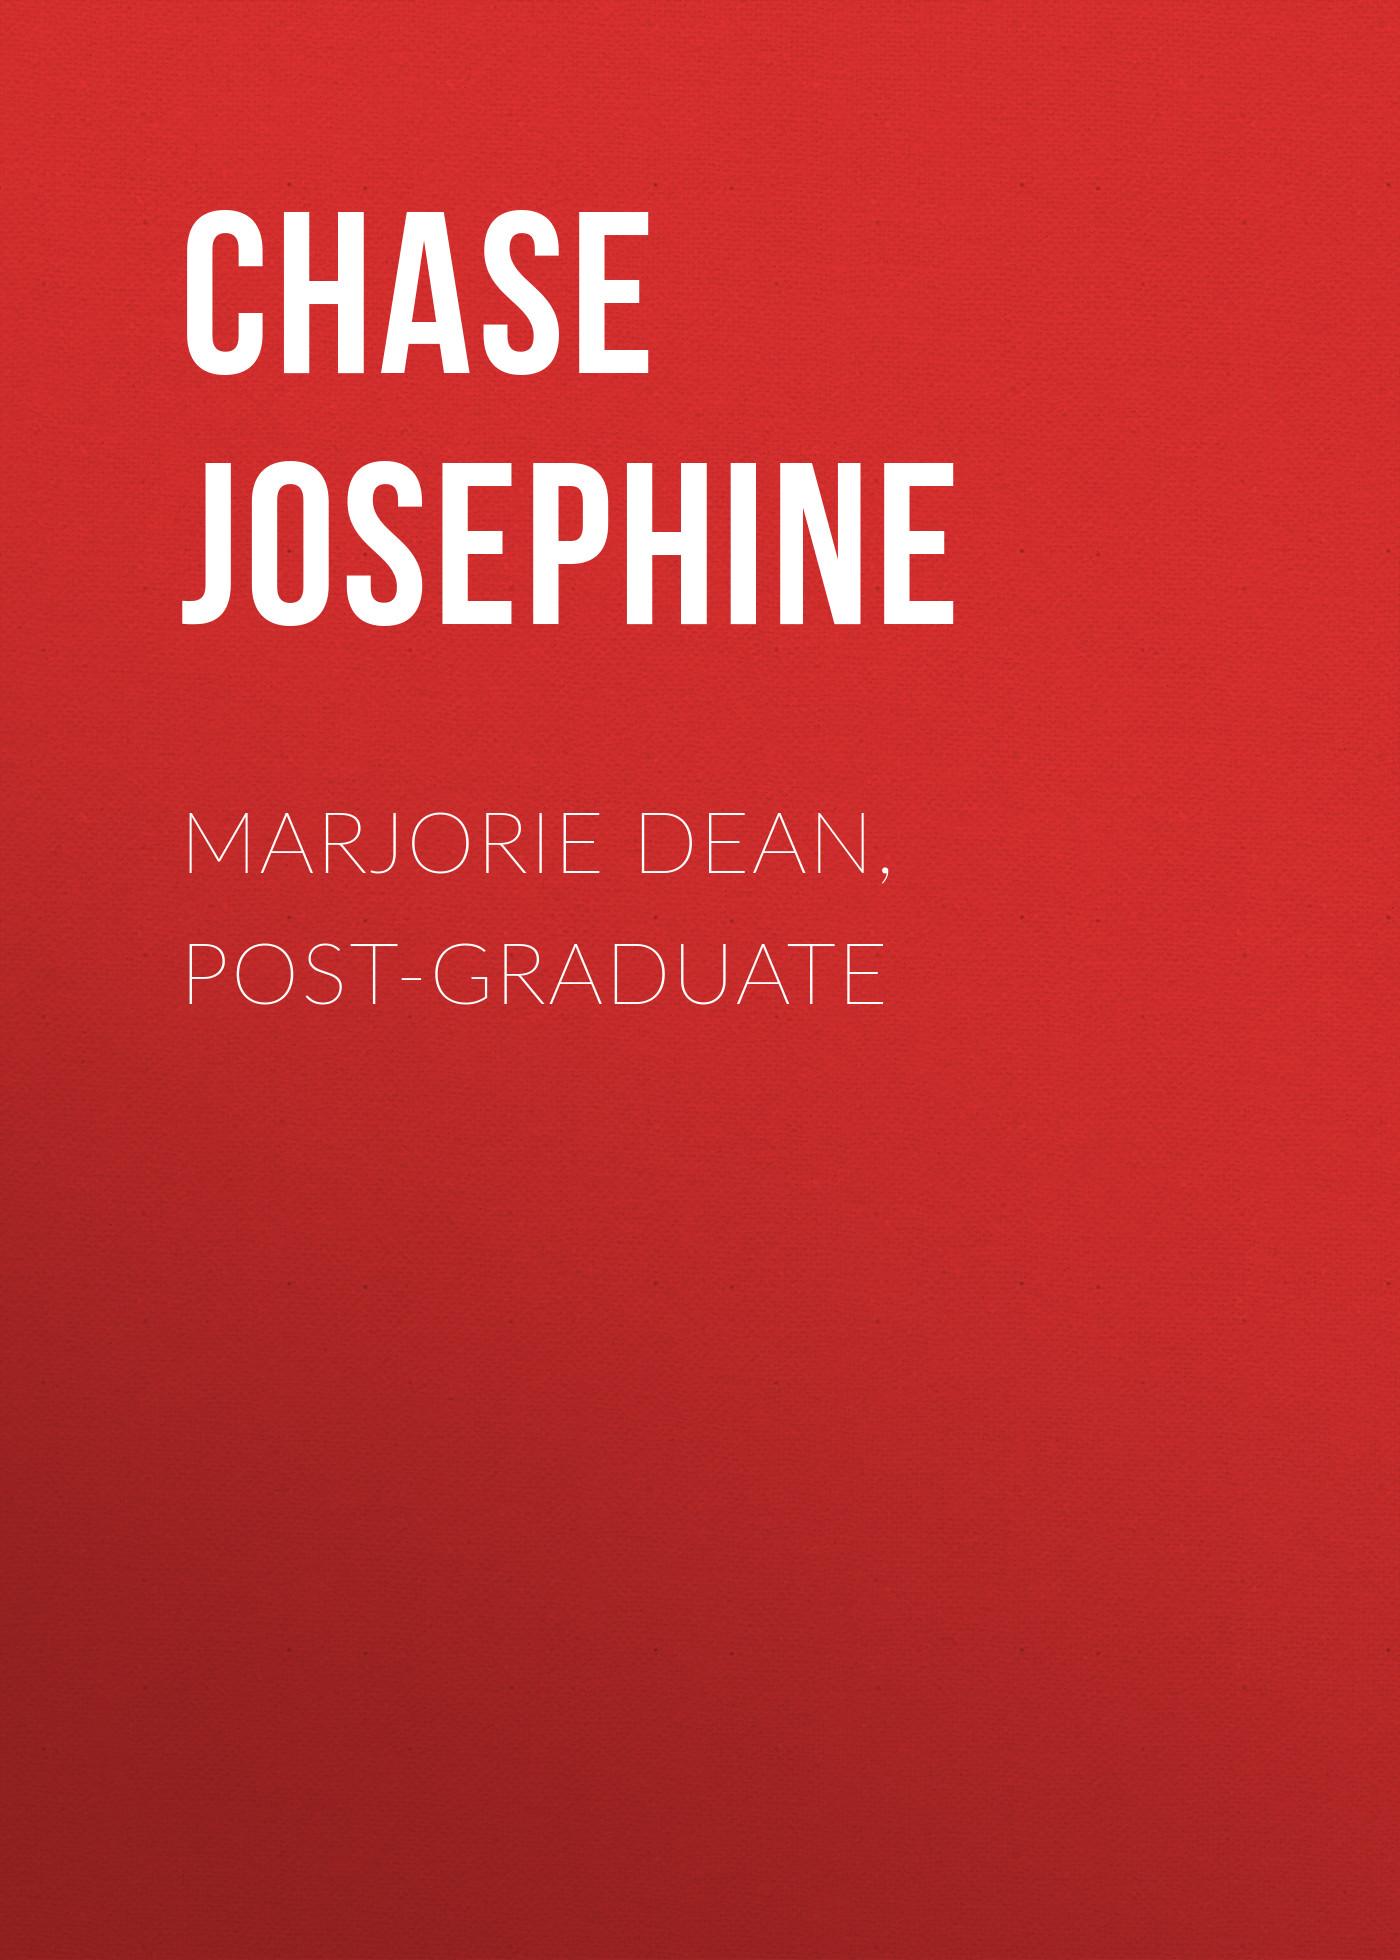 лучшая цена Chase Josephine Marjorie Dean, Post-Graduate